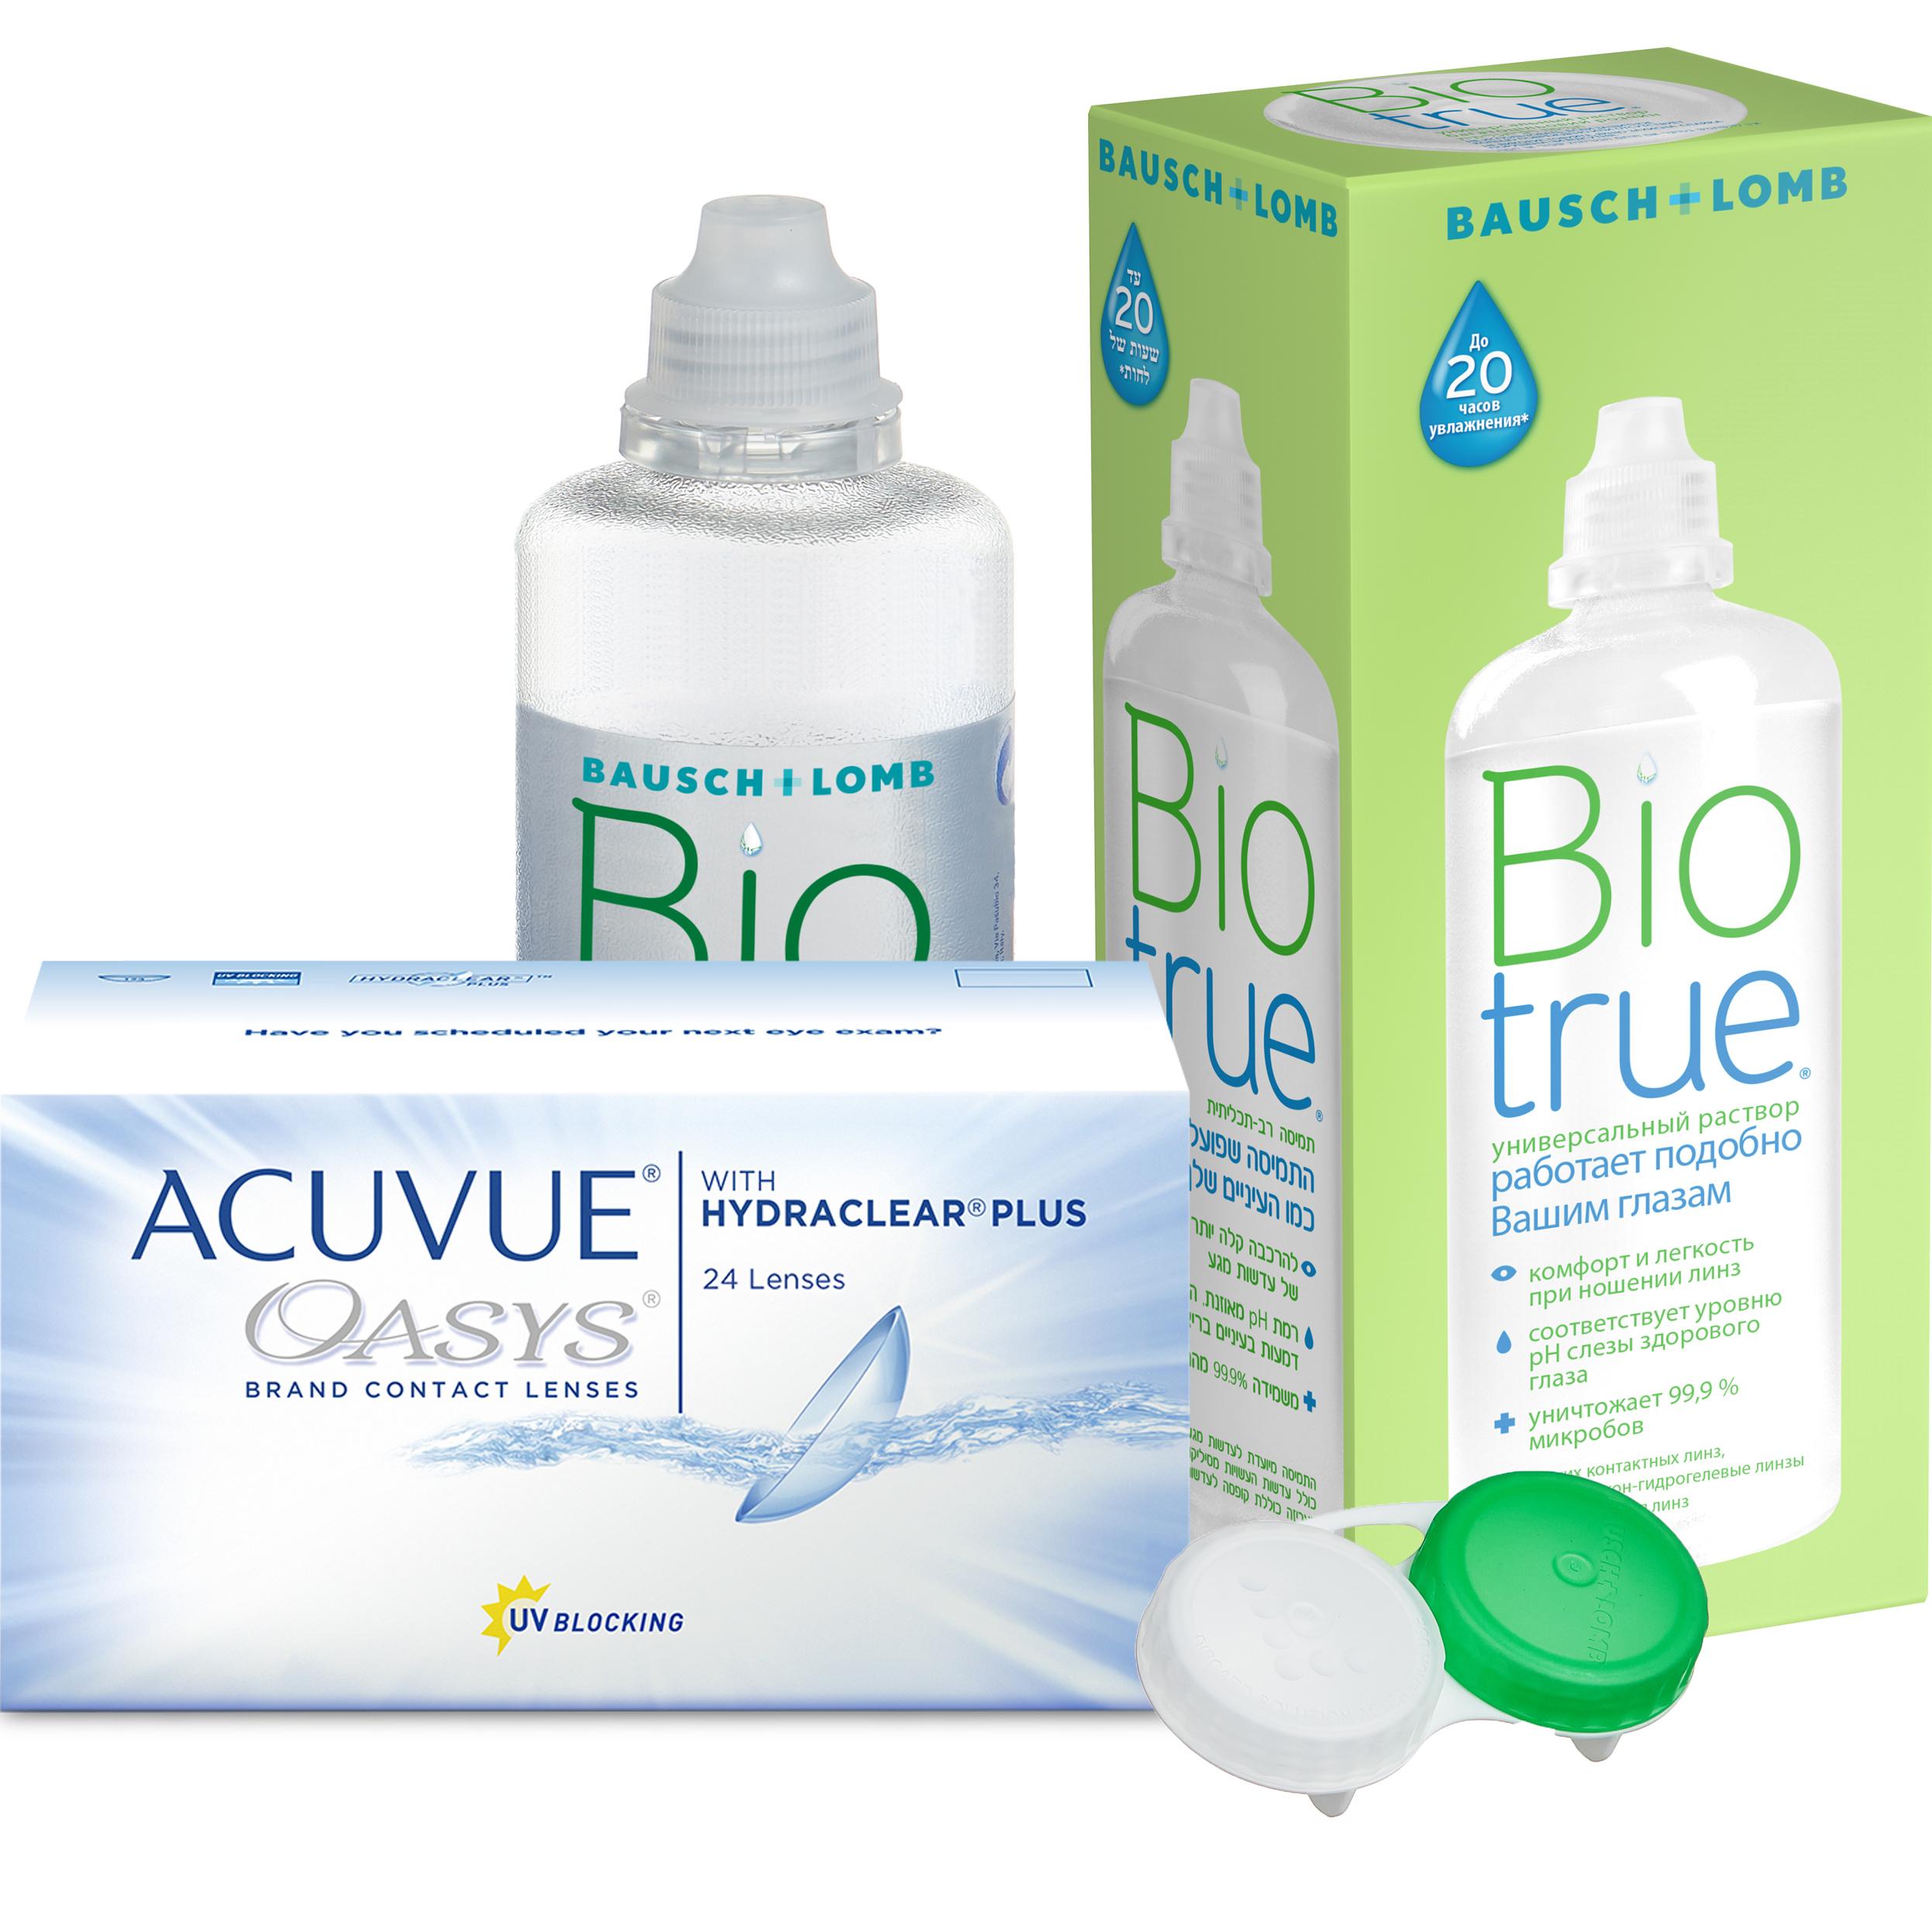 Купить Oasys with Hydraclear Plus 24 линзы + Biotrue, Контактные линзы Acuvue Oasys with Hydraclear Plus 24 линзы R 8.4 -10, 50 + Biotrue 300 мл